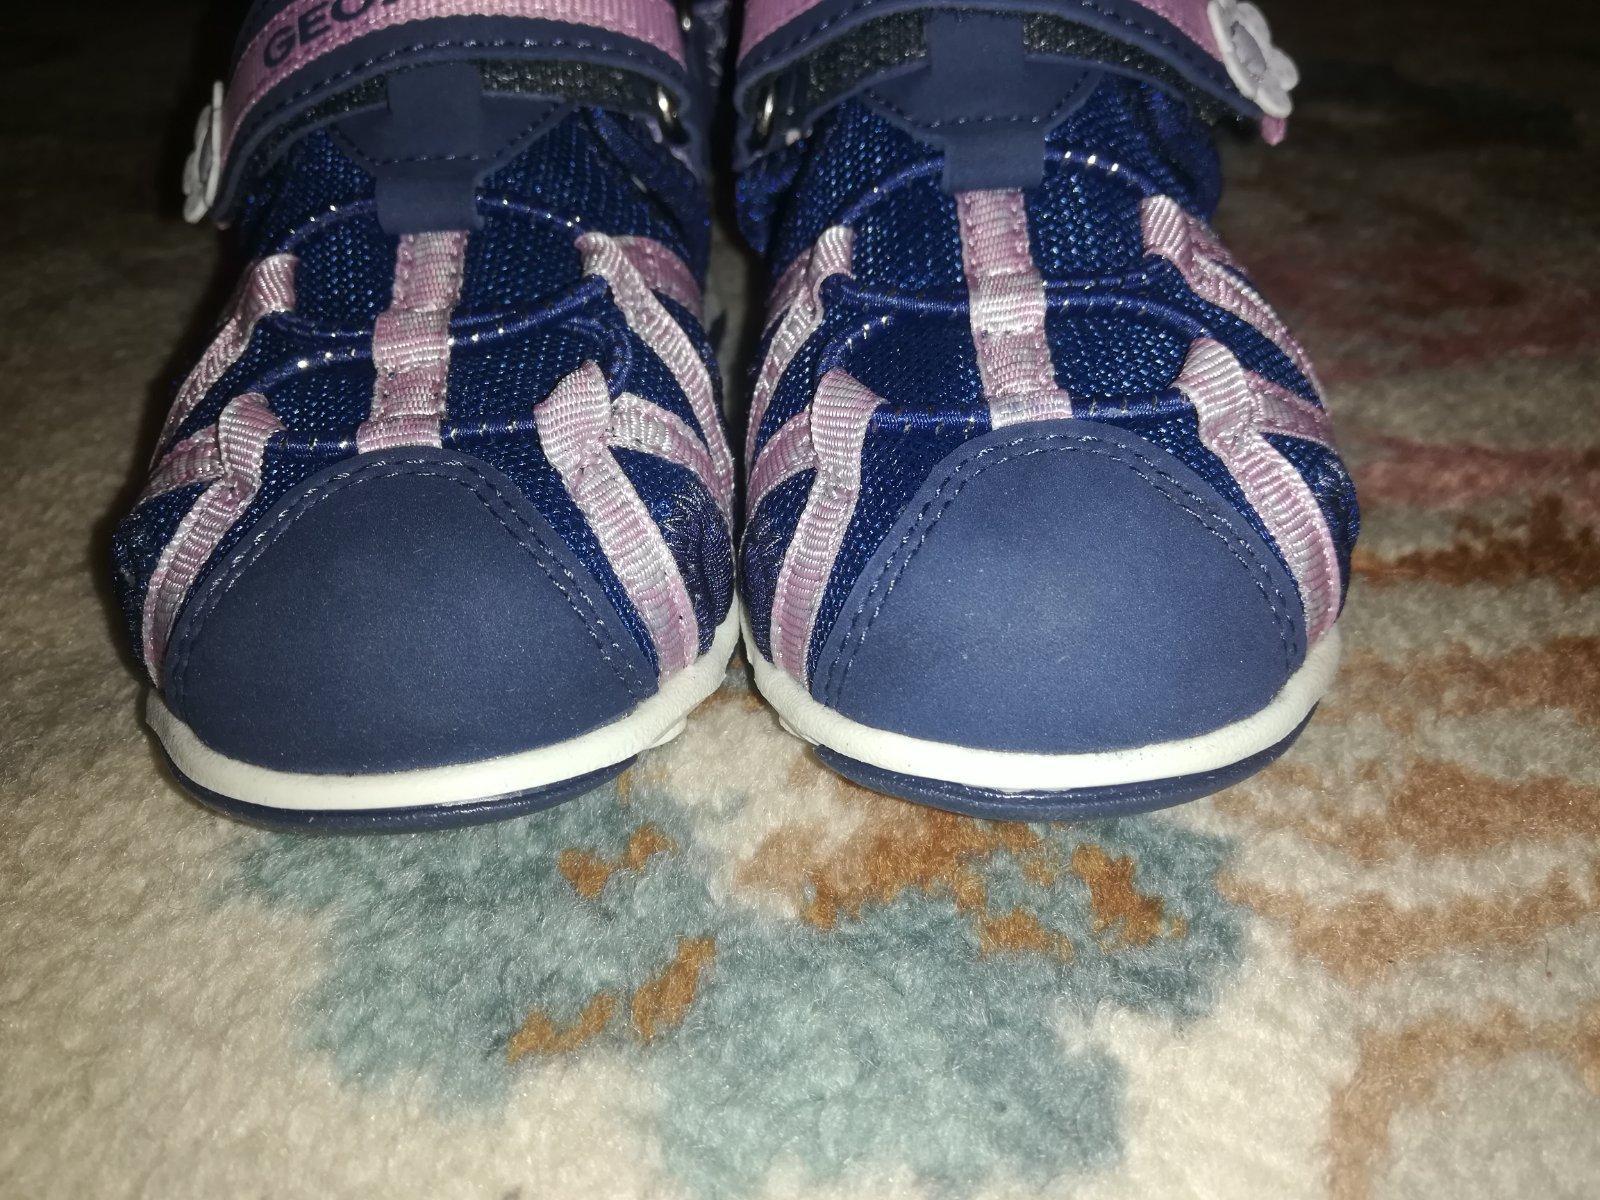 Sandalky Geox - Obrázok č. 2